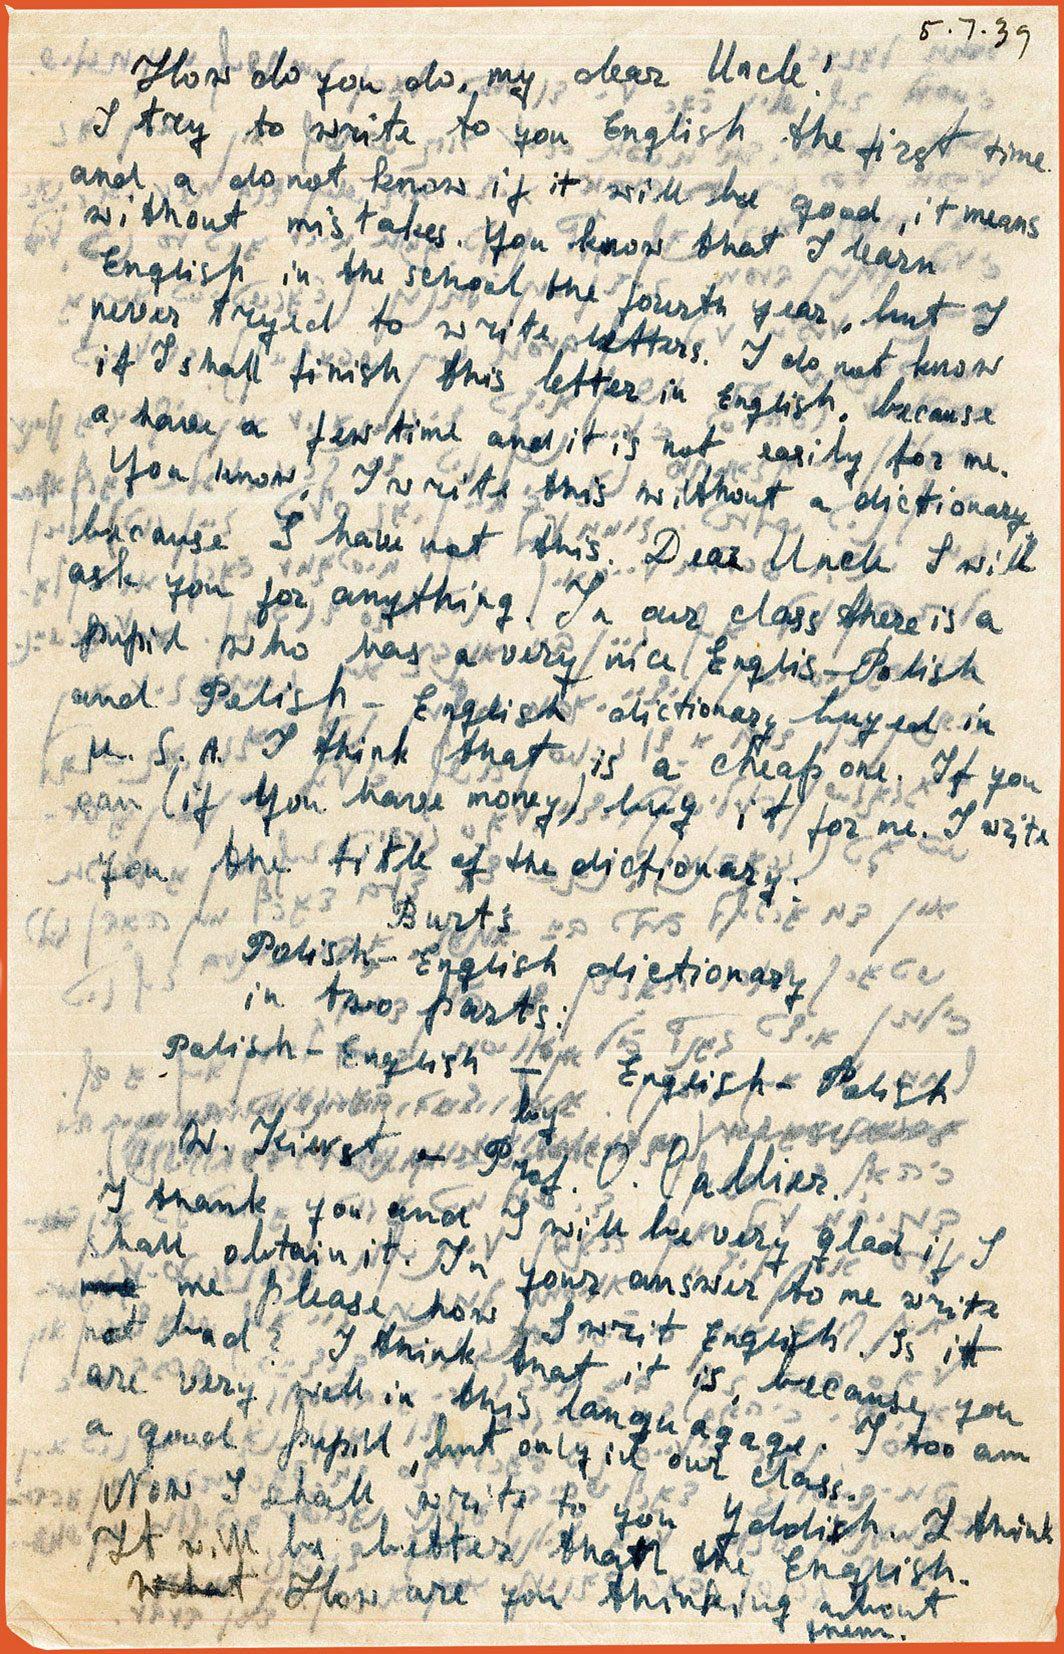 English half of letter from Beba